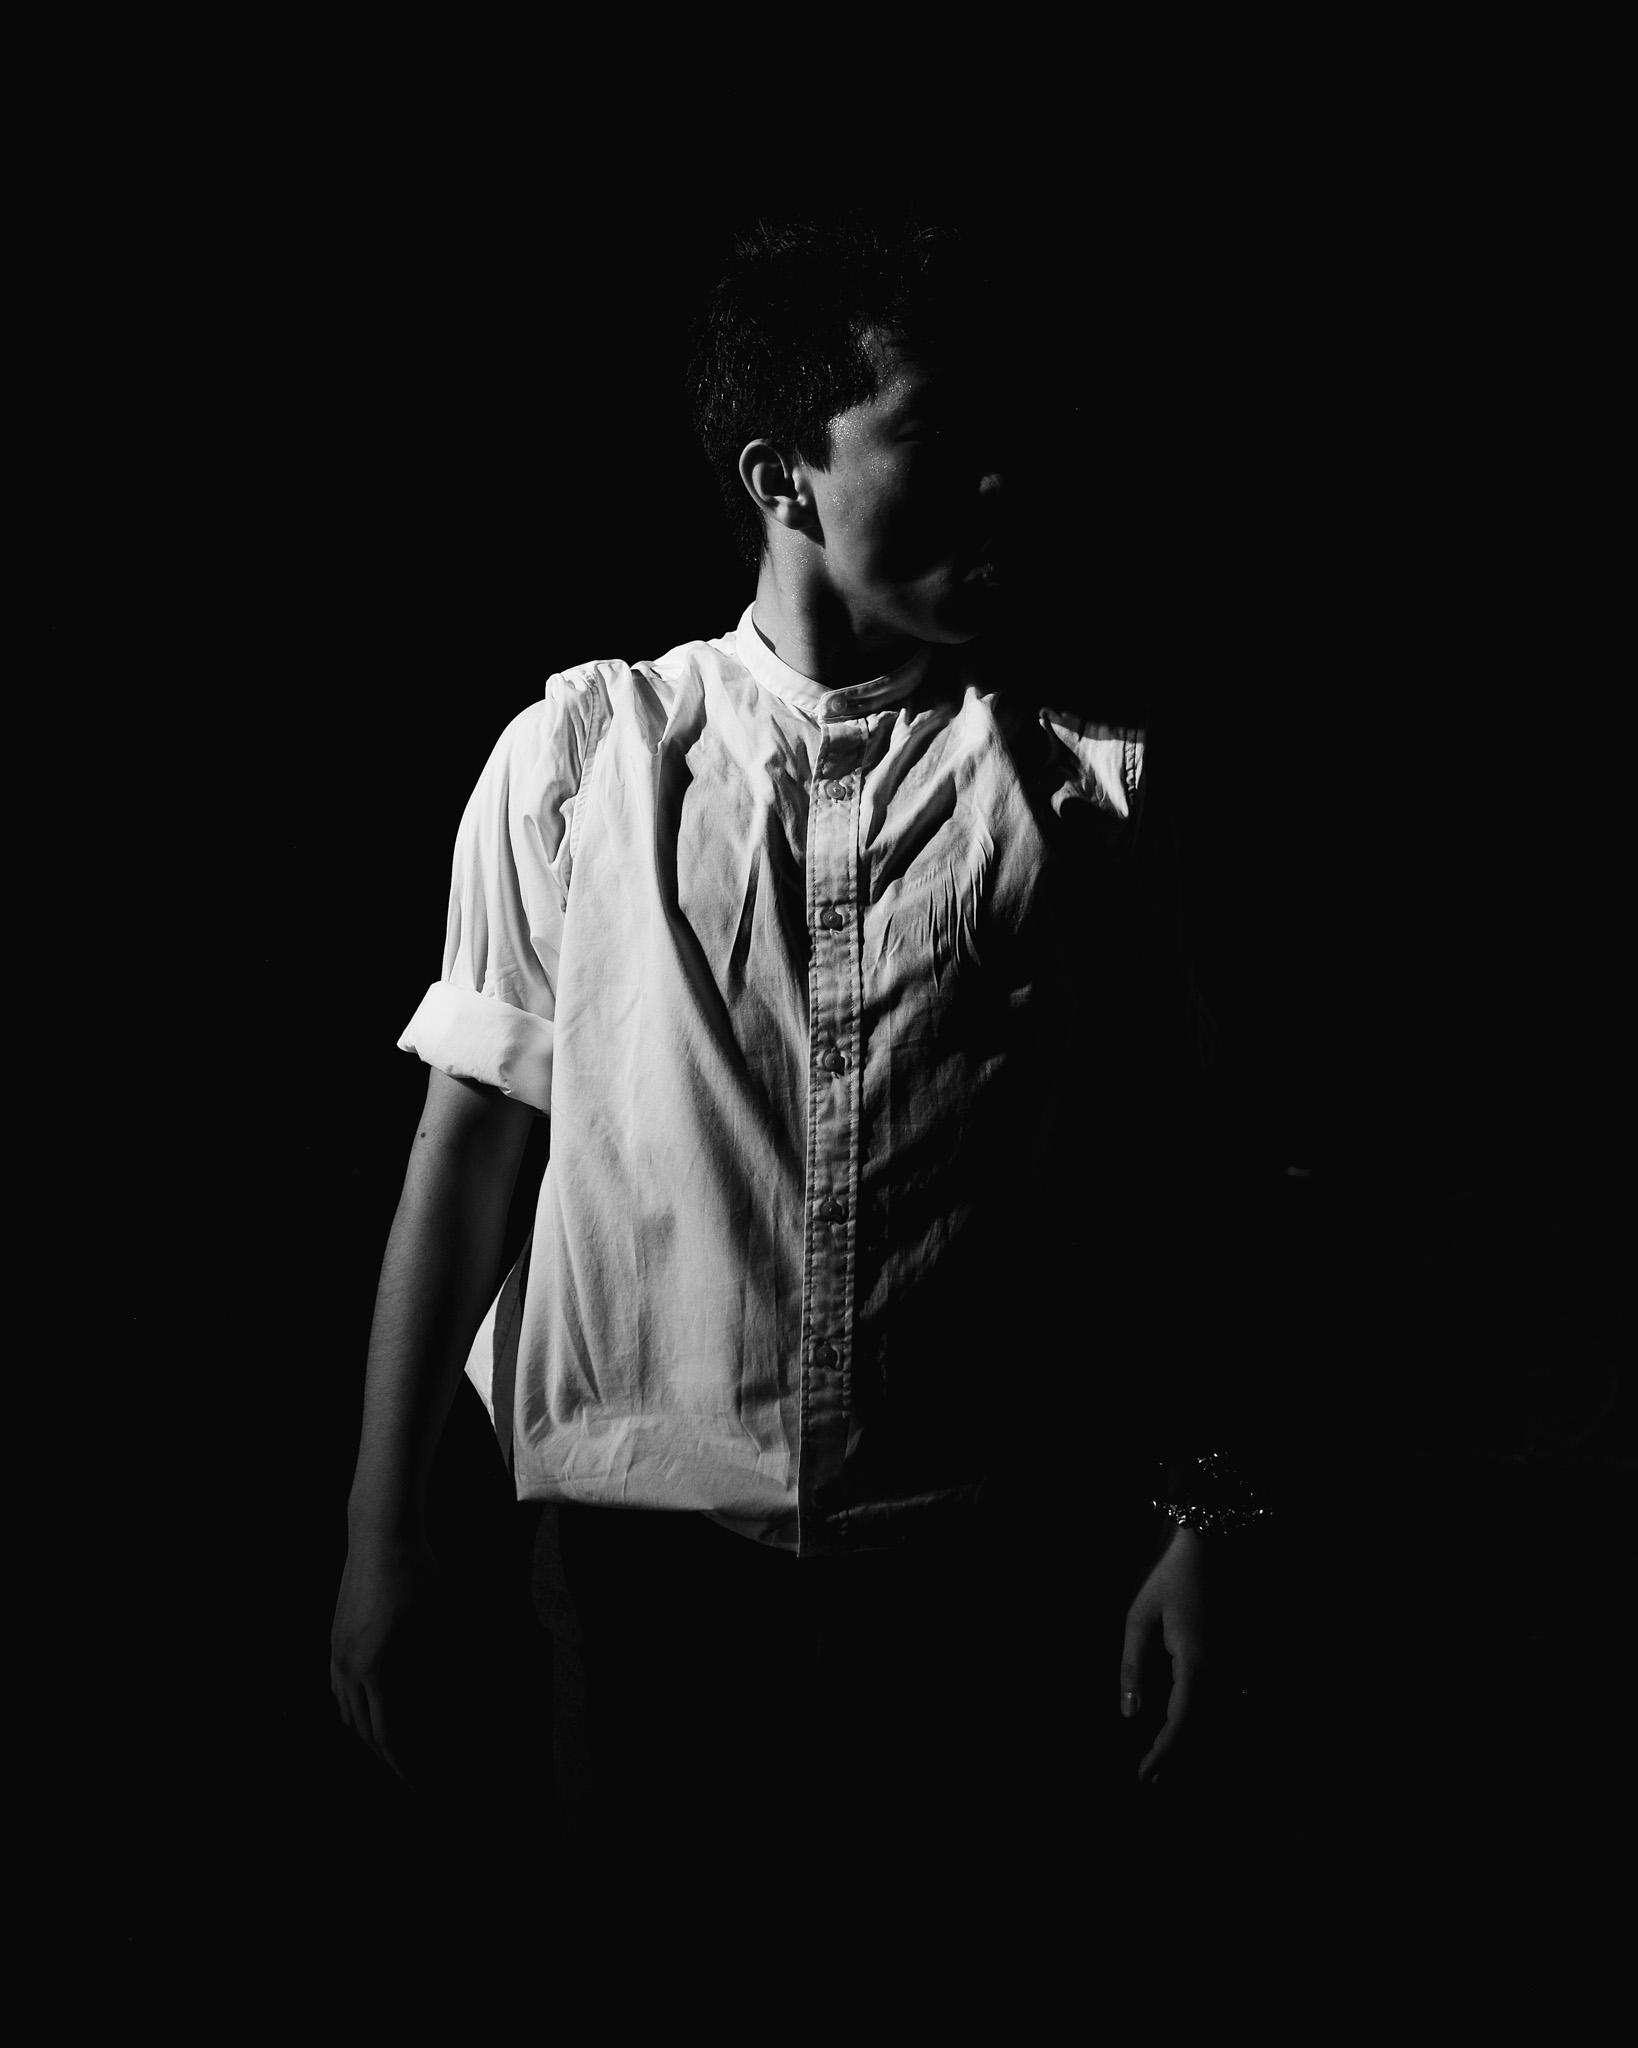 Dance_Halifax_arts_kinetic_breath_Fox_and_fellow-1.jpg